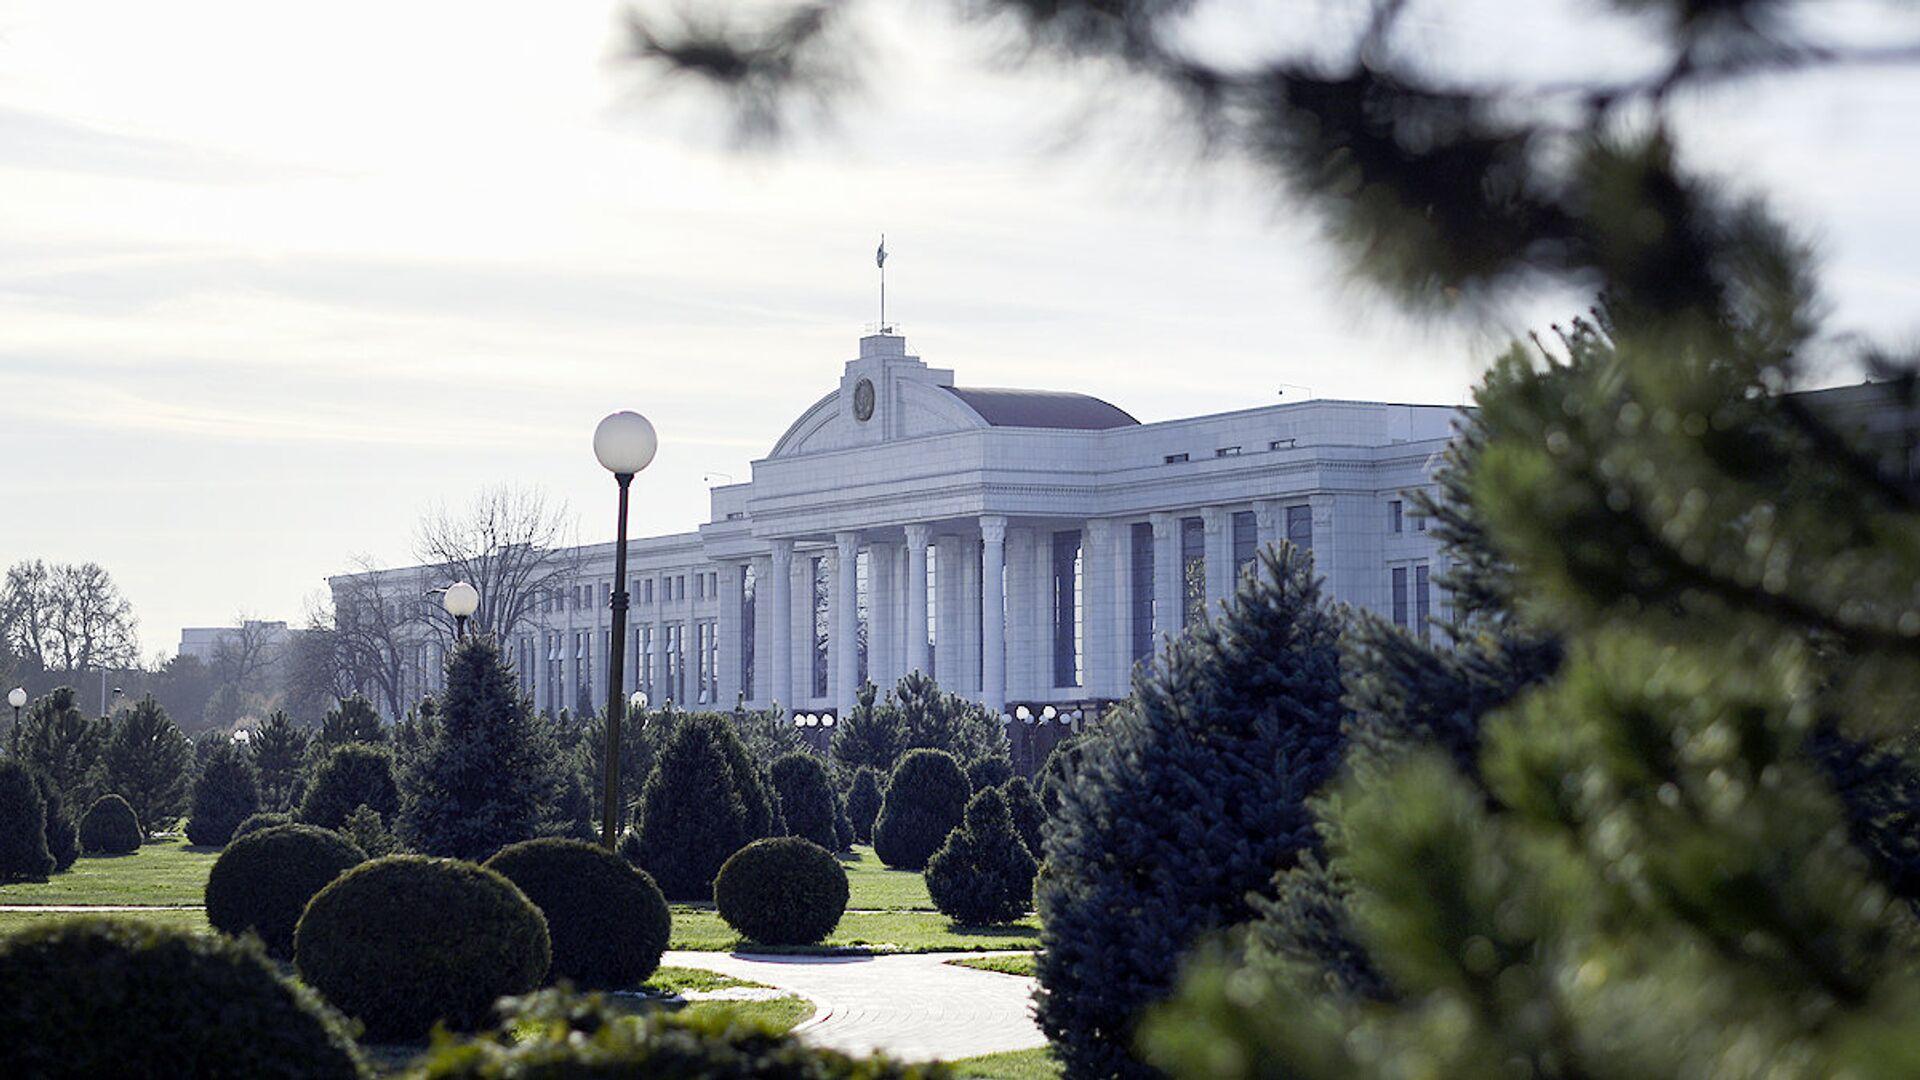 Здание Сената Олий Мажлиса Республики Узбекистан в Ташкенте - Sputnik Узбекистан, 1920, 25.06.2021